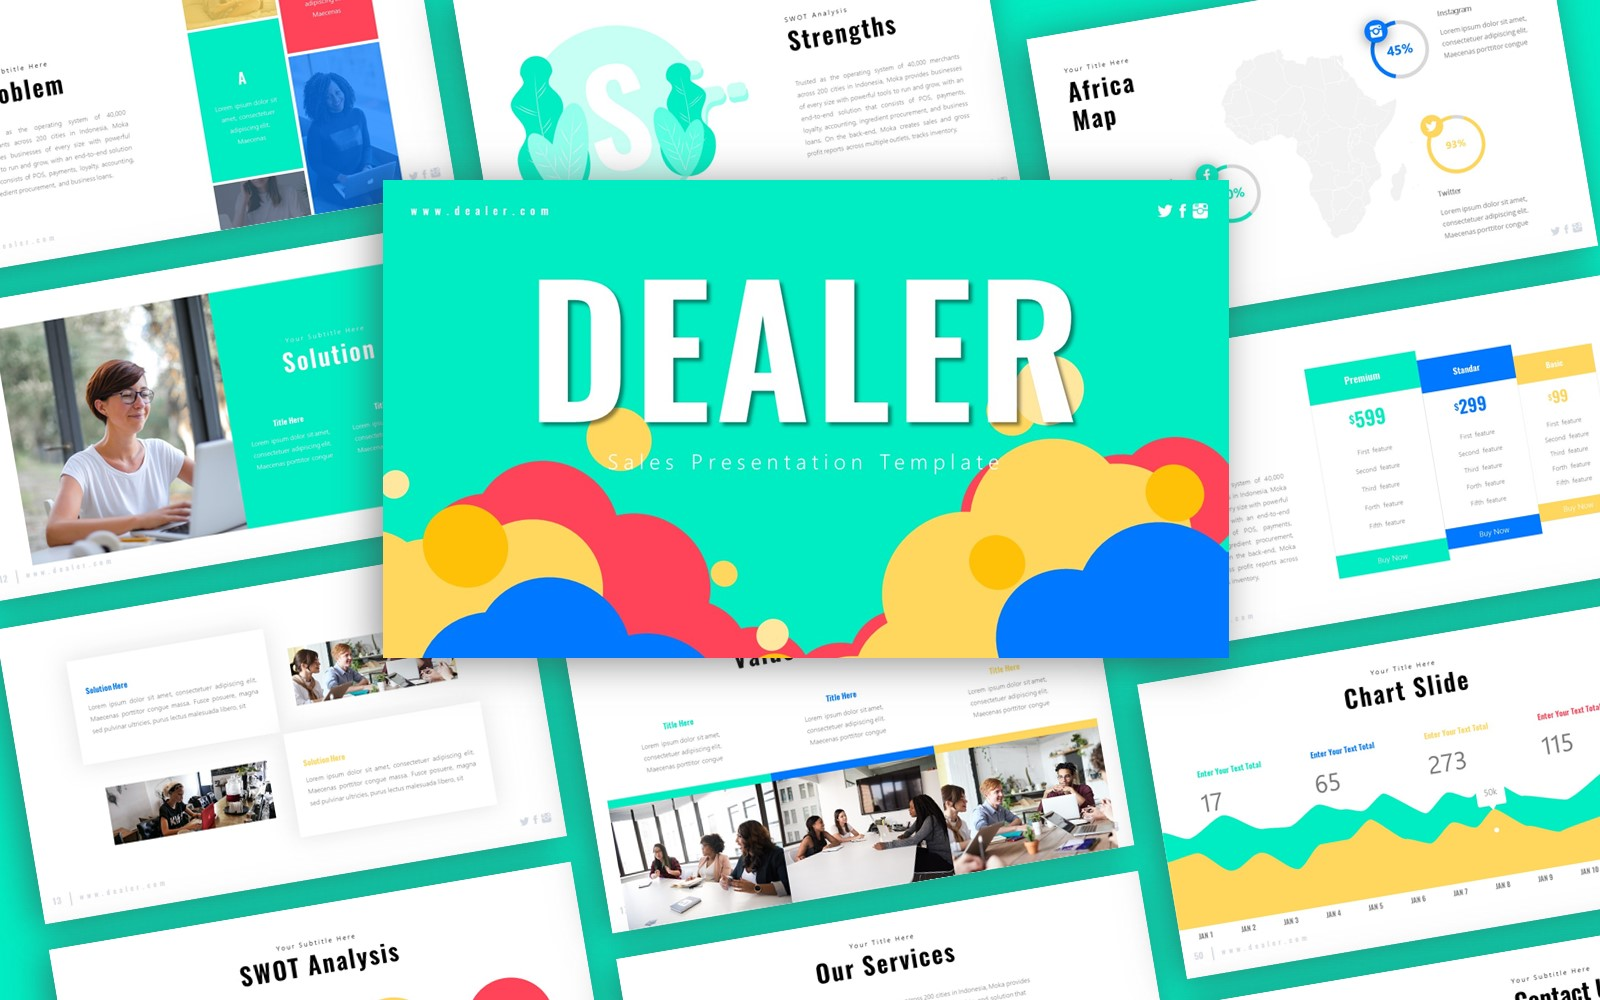 Dealer Sales Presentation PowerPoint Template